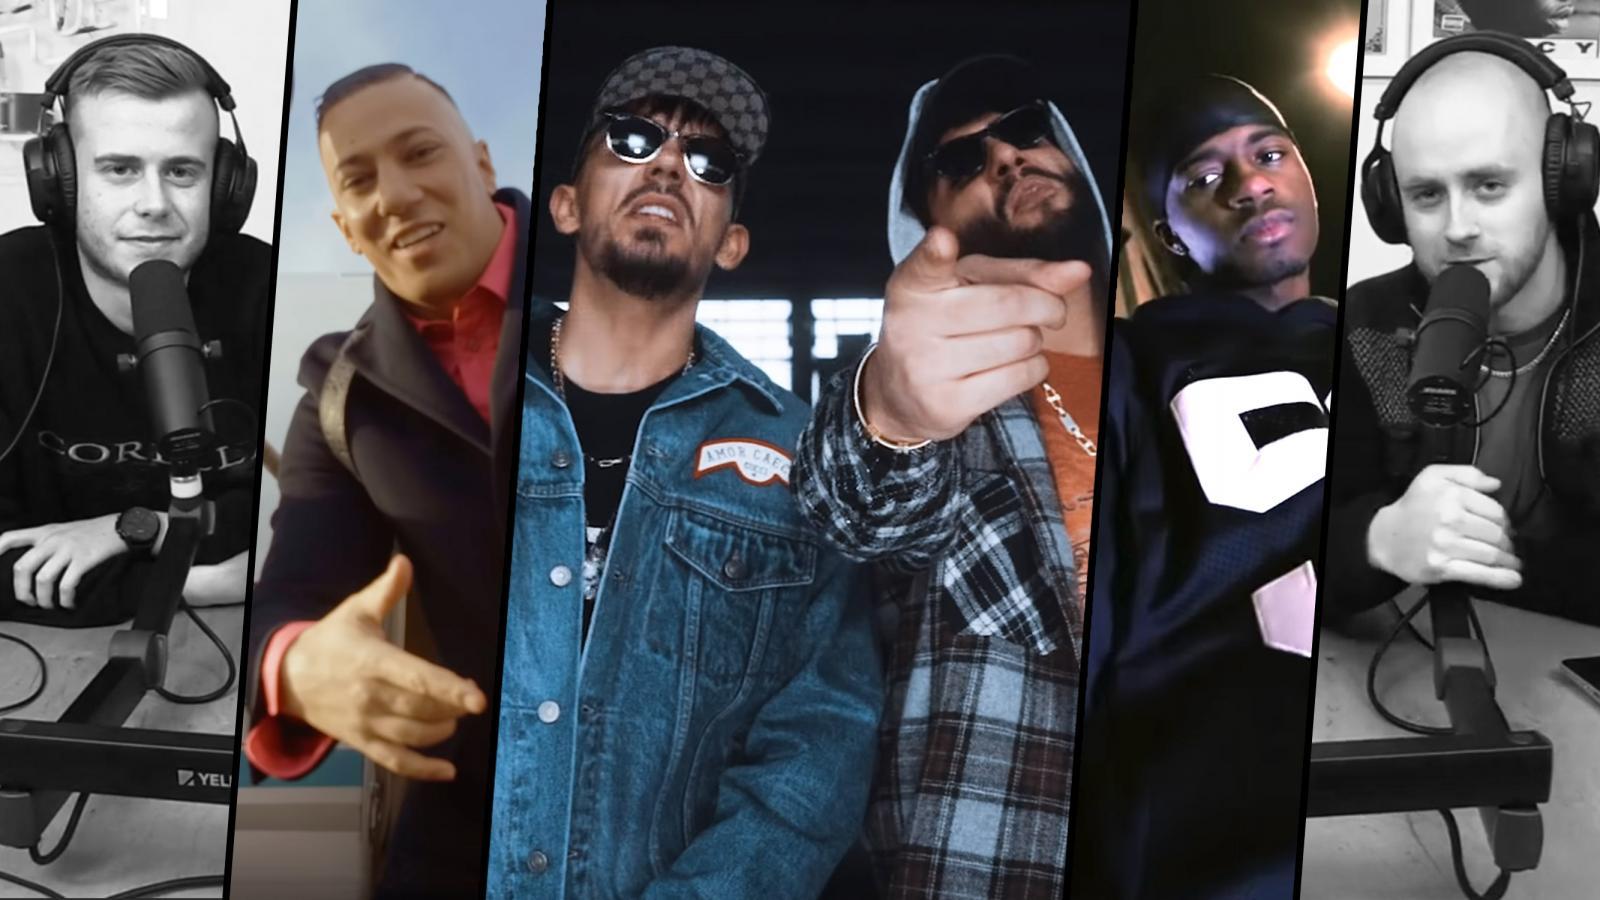 Capital Bra & Samra, Farid Bang, Elias, Capo, Ansu, CGoon & mehr –  Release Friday